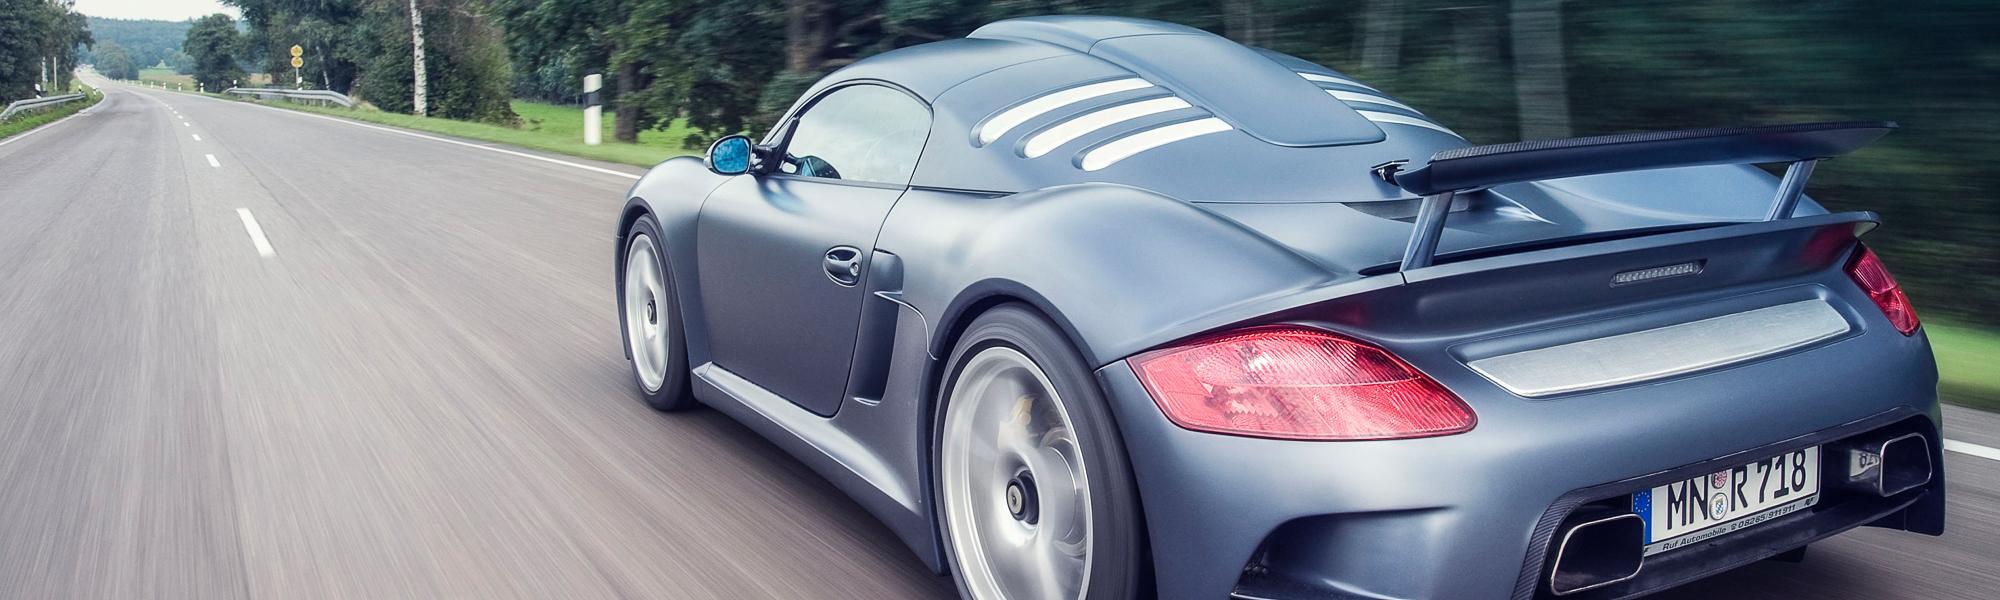 Automotive Carbontechnik Kunststofftechnik.jpg